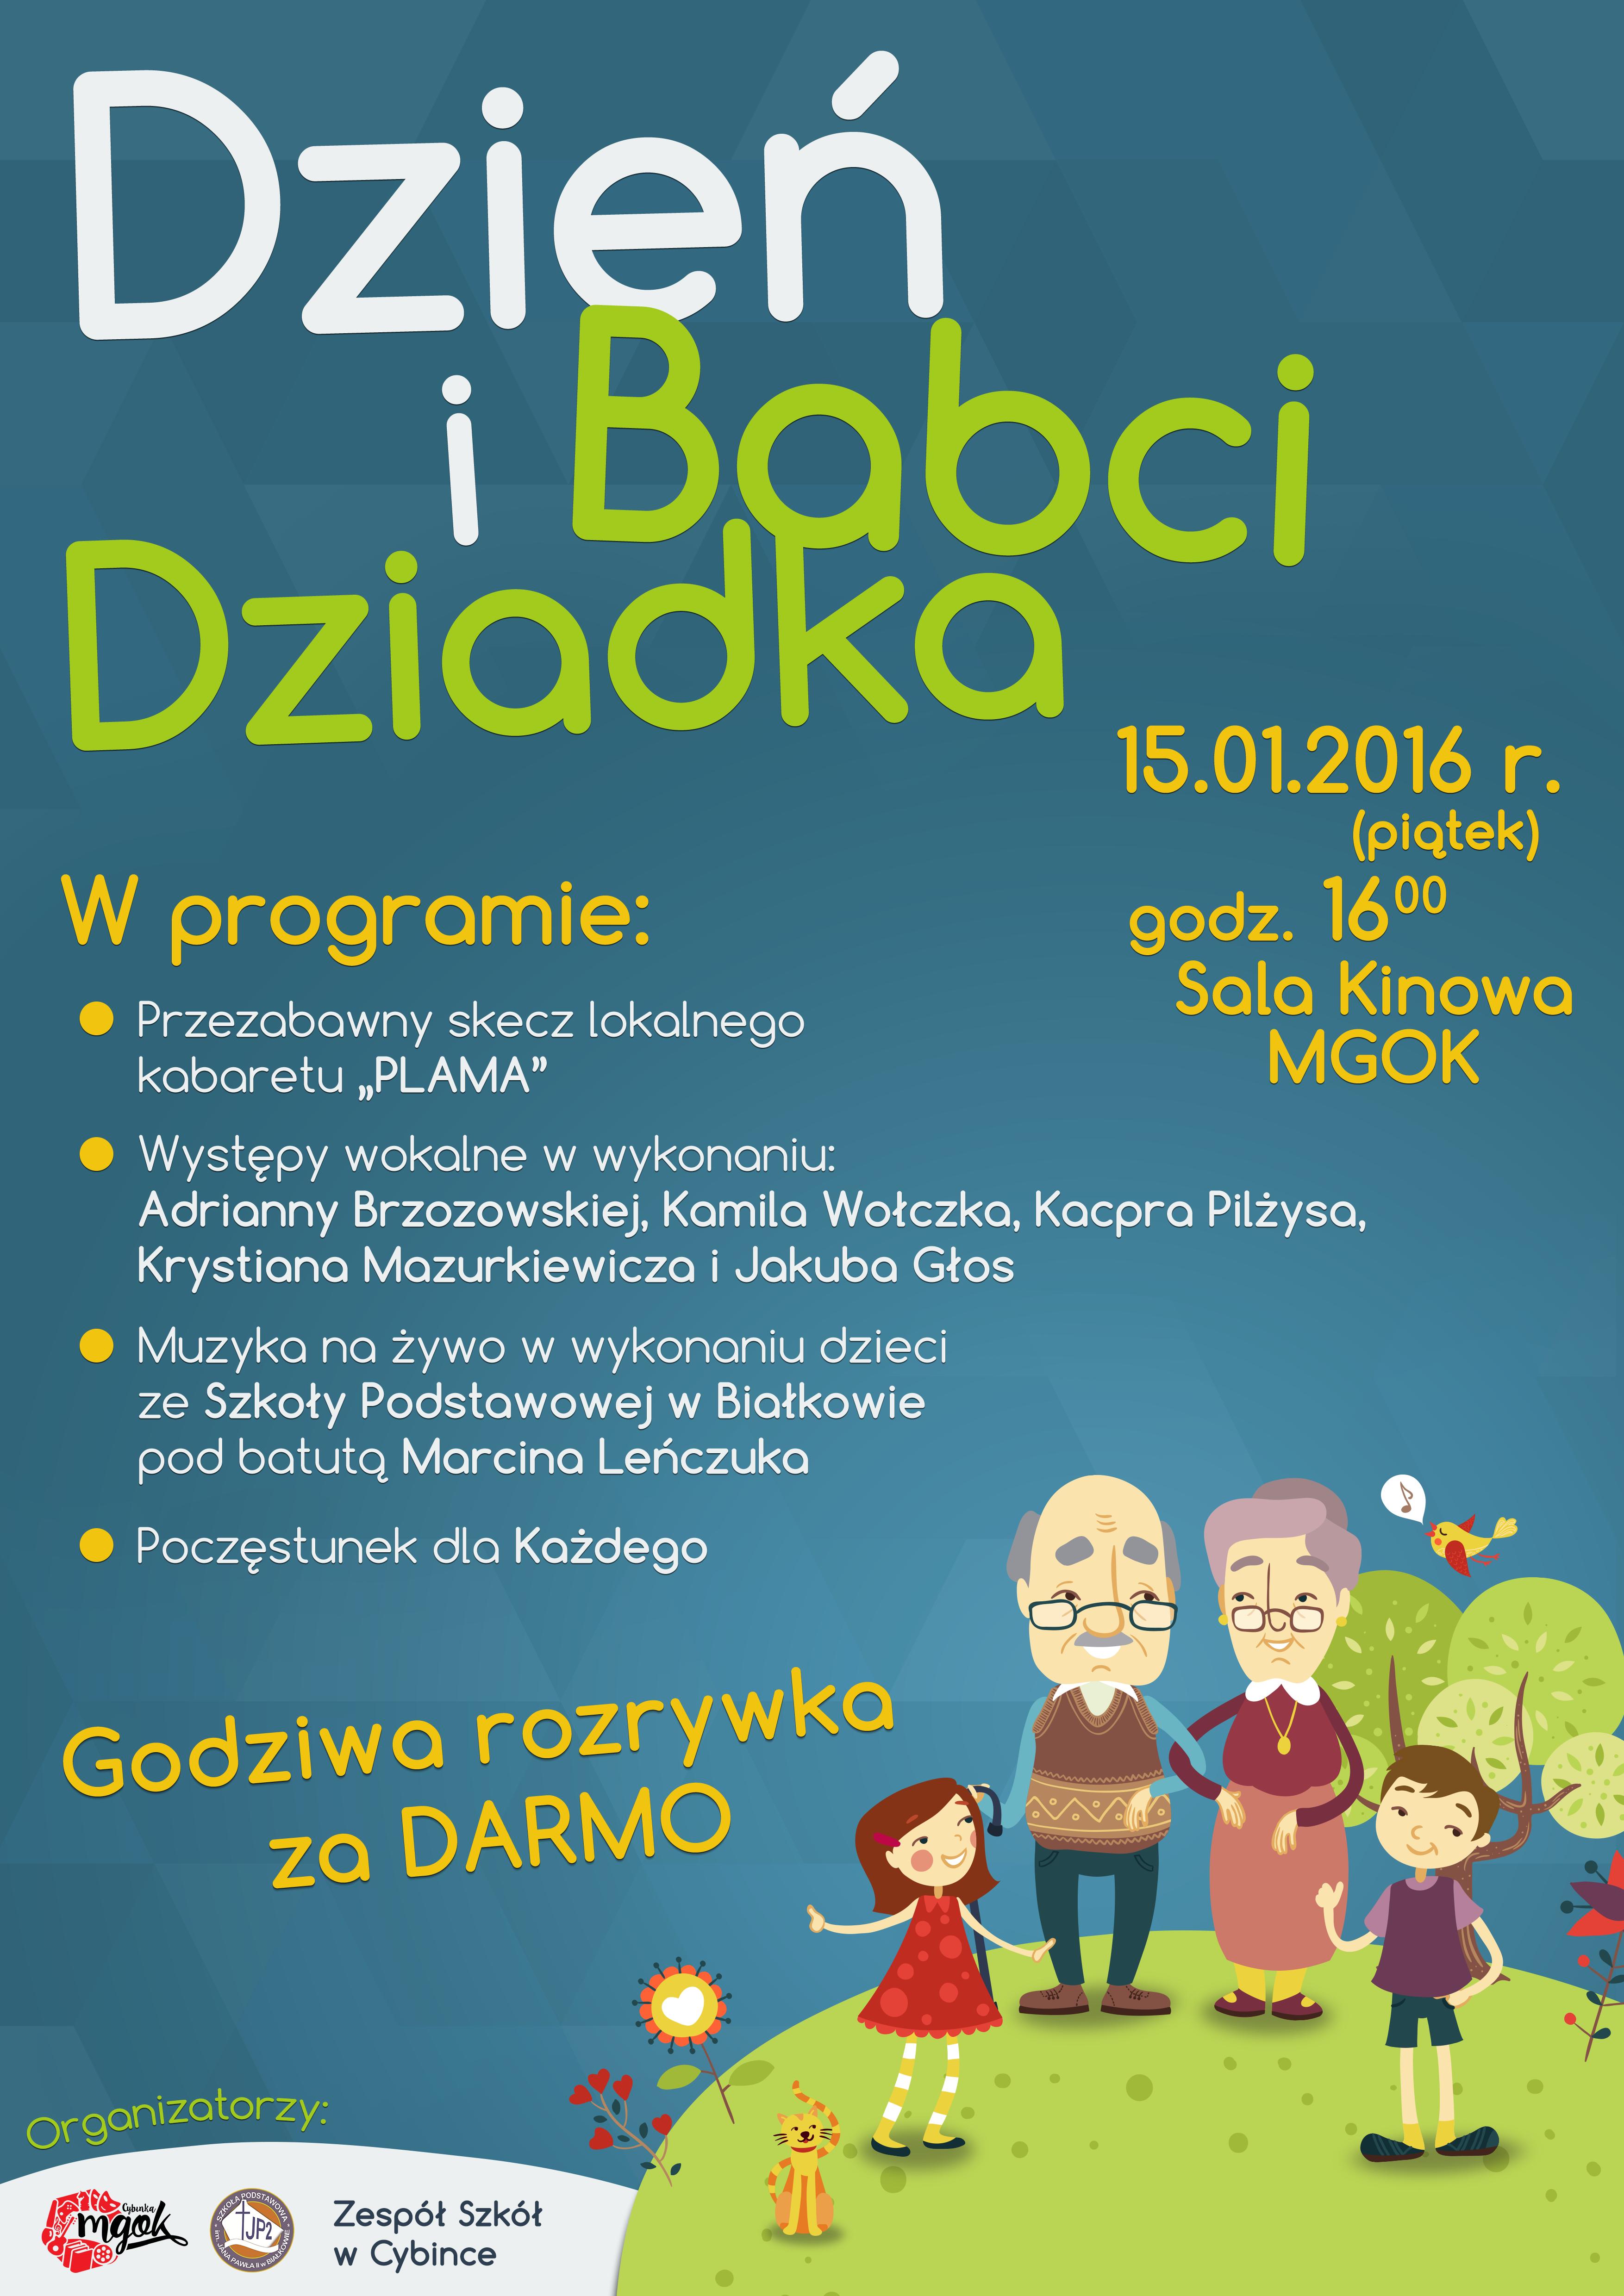 Plakat_Dzien_Babci_Dziadka